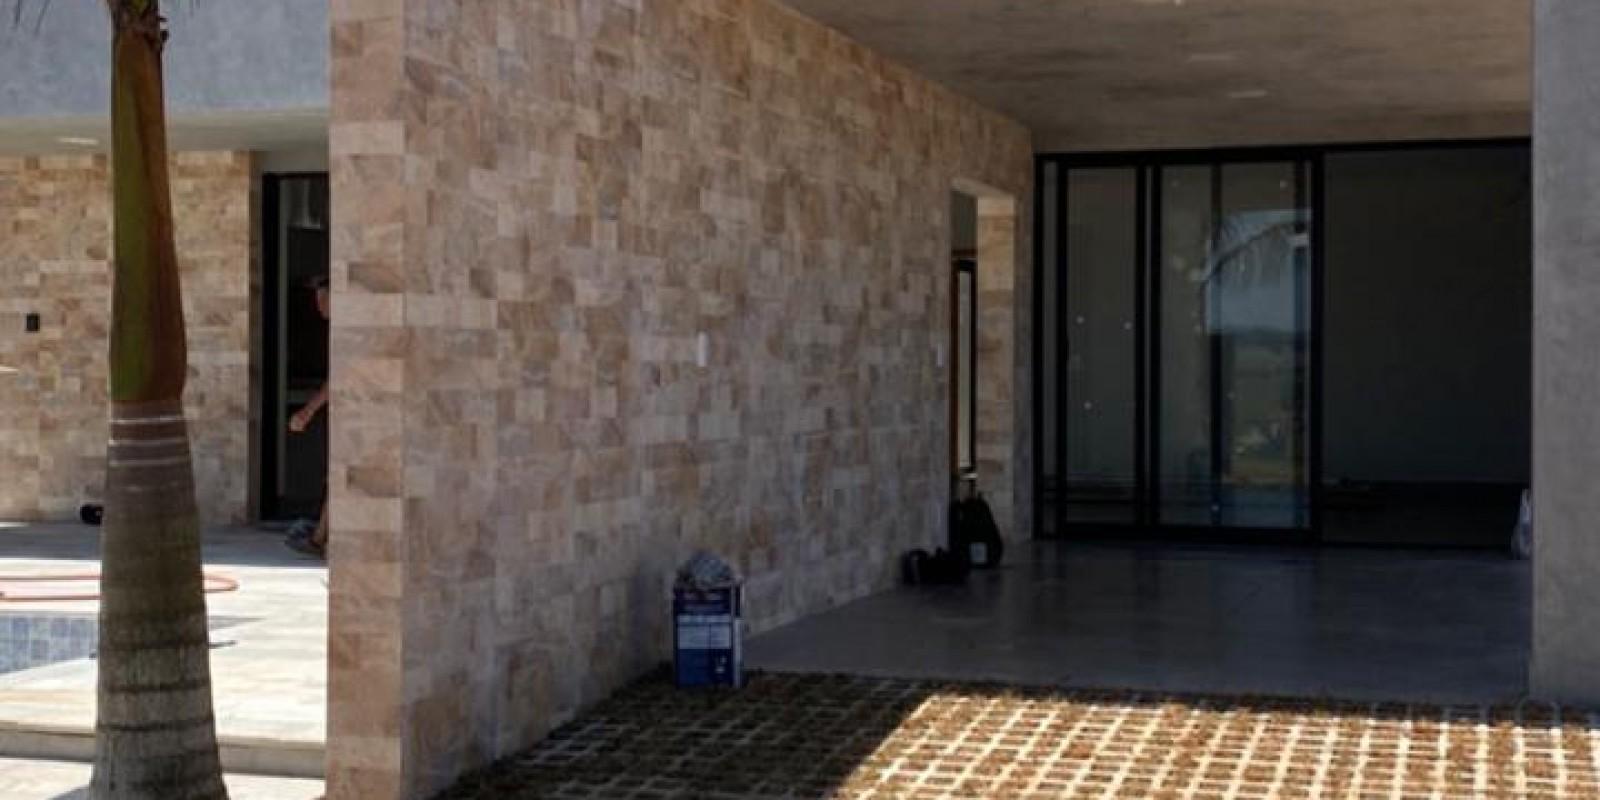 Casa na Represa no Condomínio Reviera de Sta Cristina XIII - Foto 23 de 25